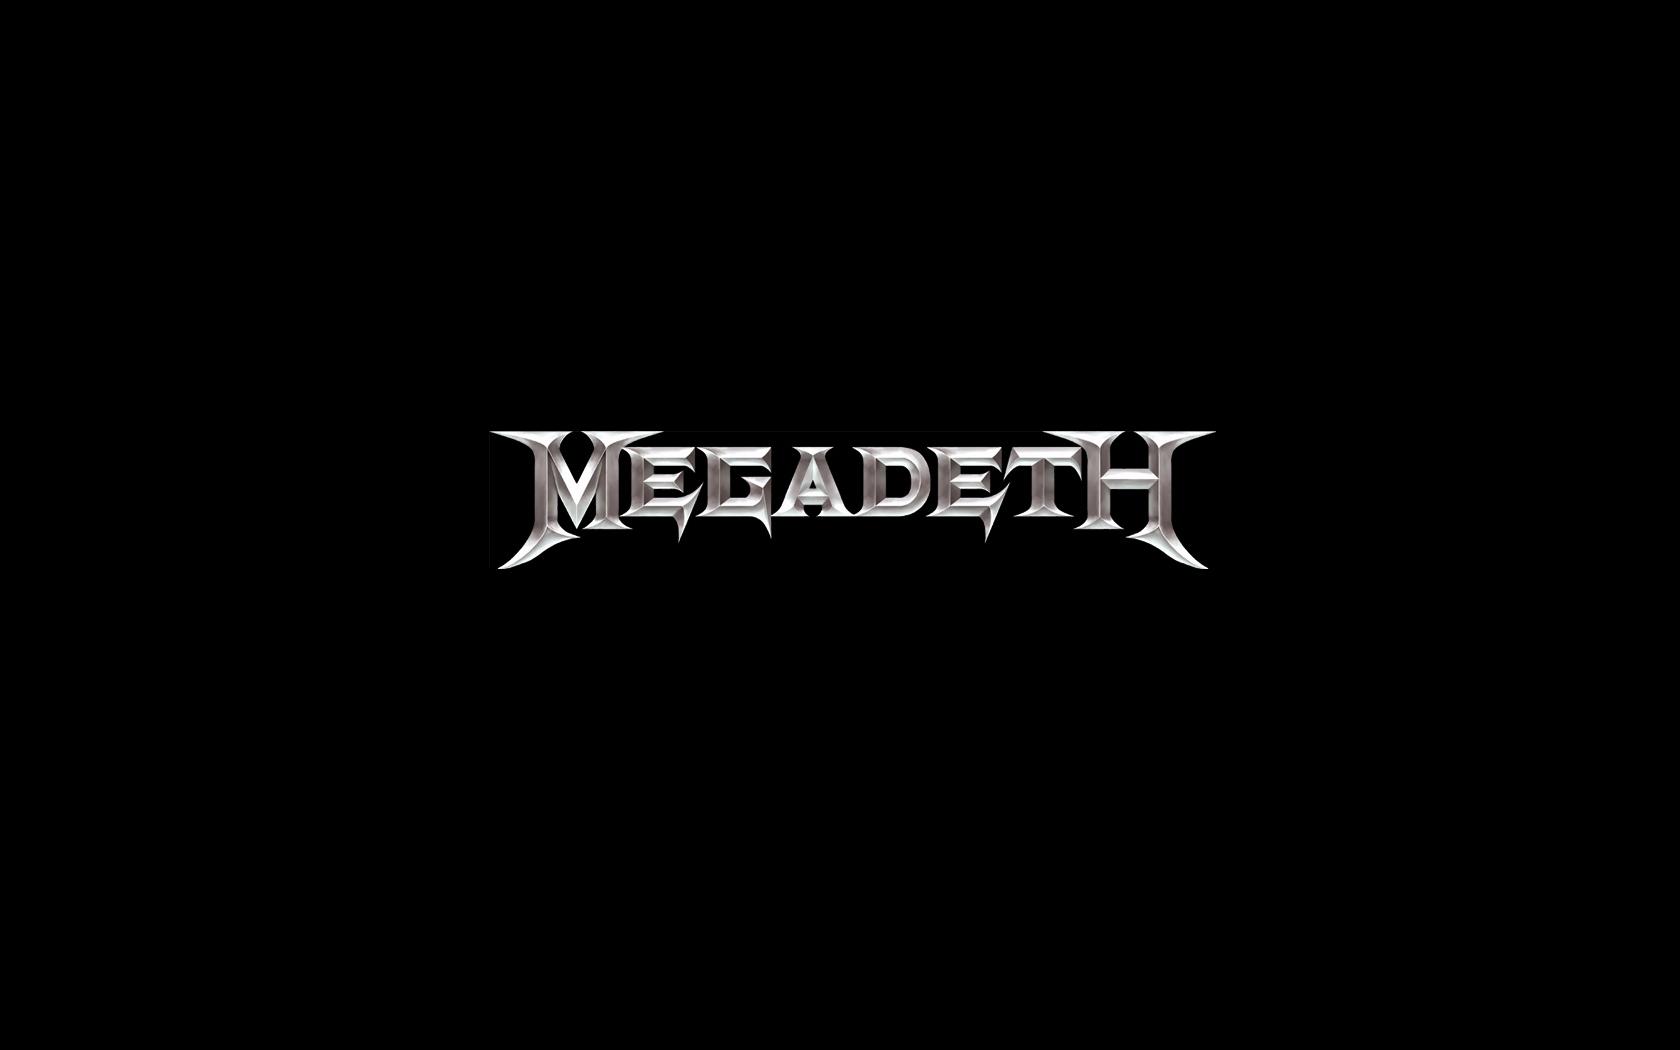 Megadeth Wallpaper By Leonardi17